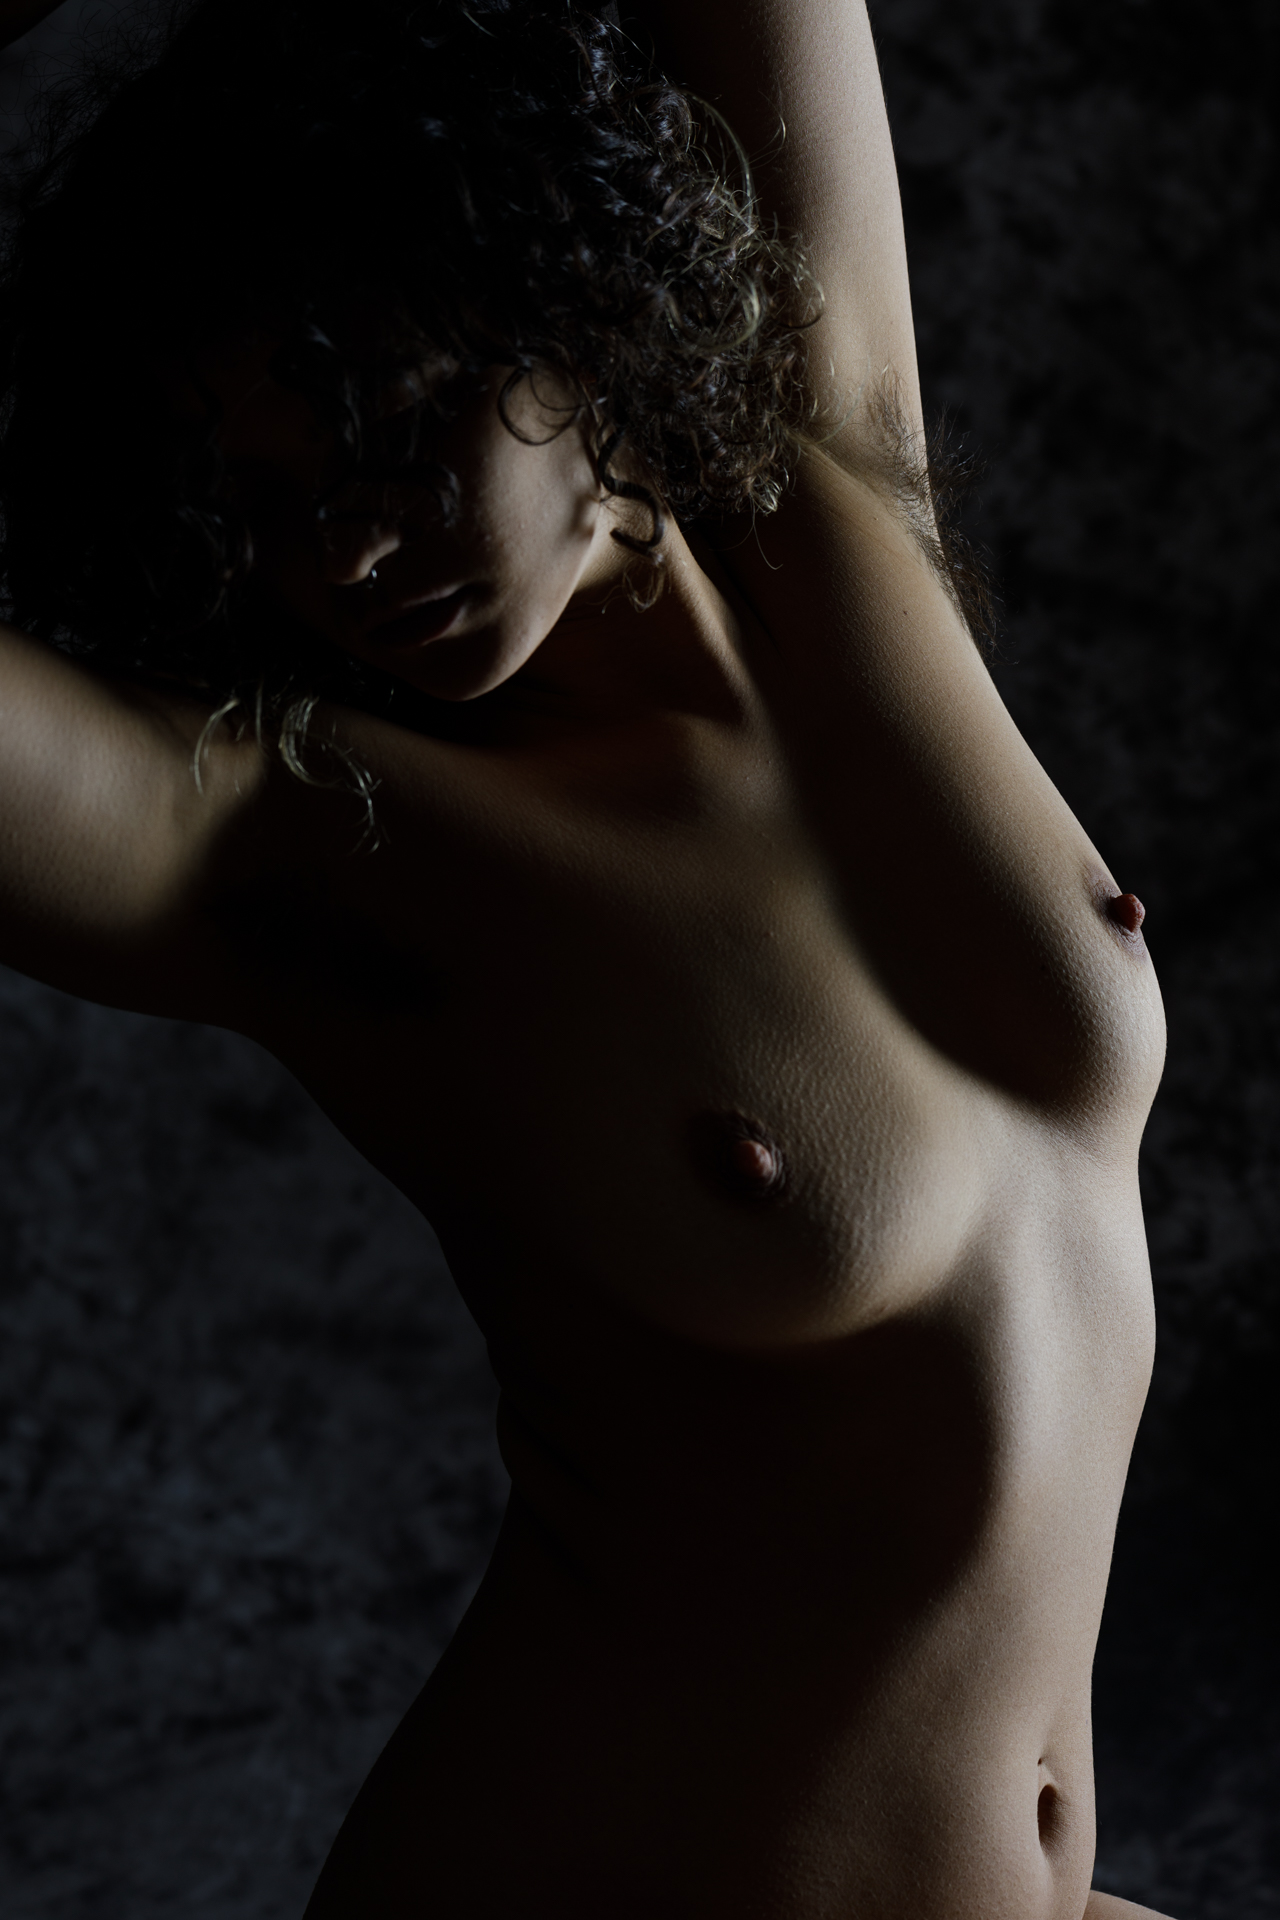 CFrenette-Miss-Abiblue-26